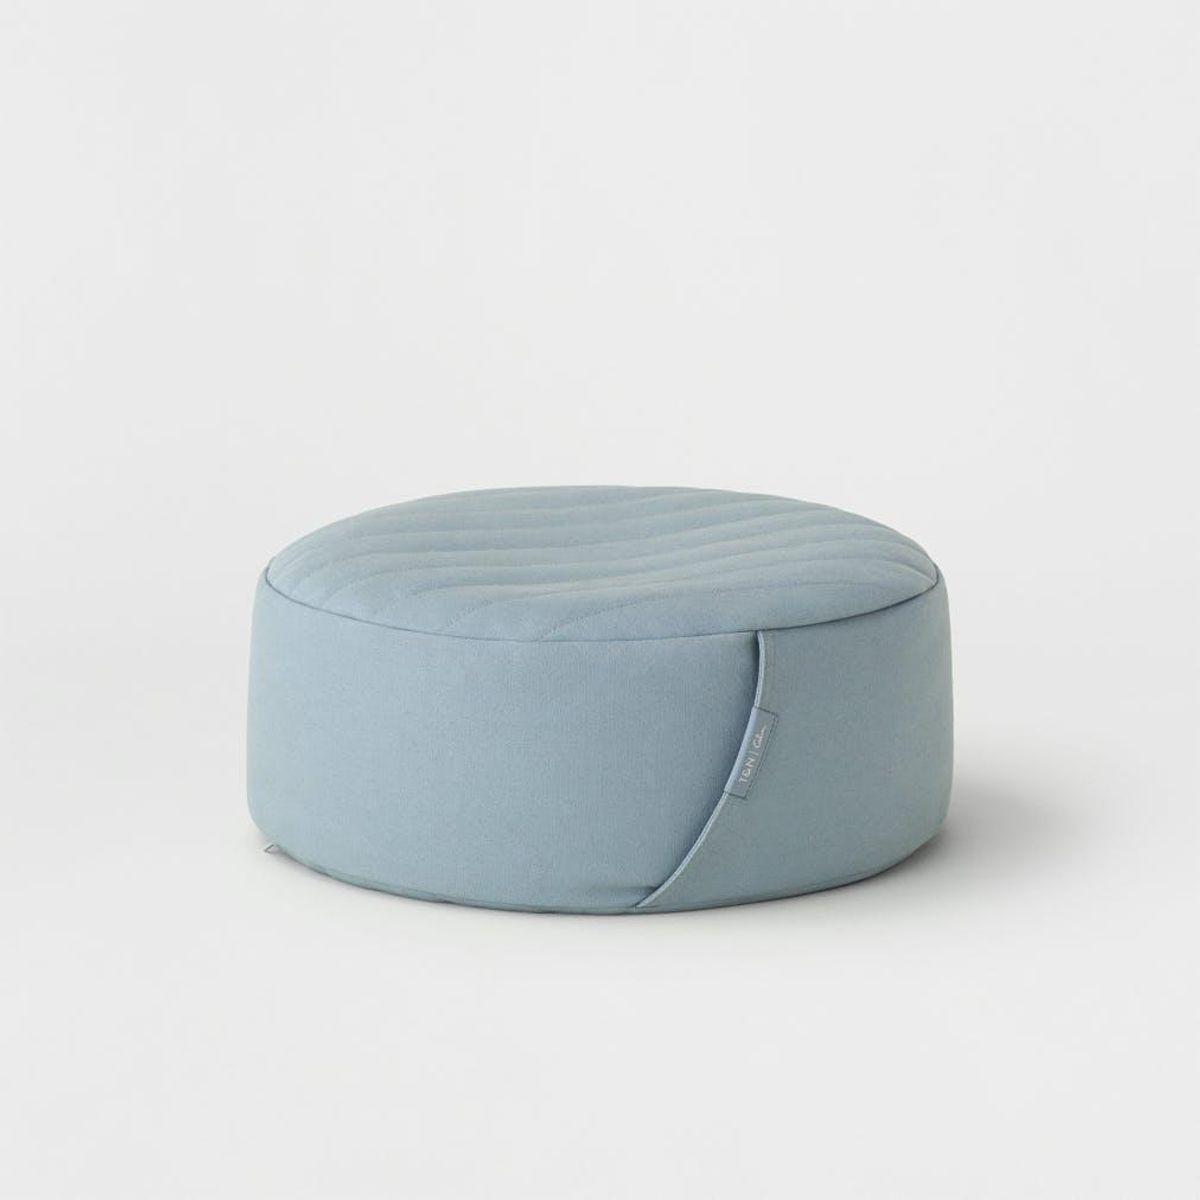 tuft and needle calm meditation cushion